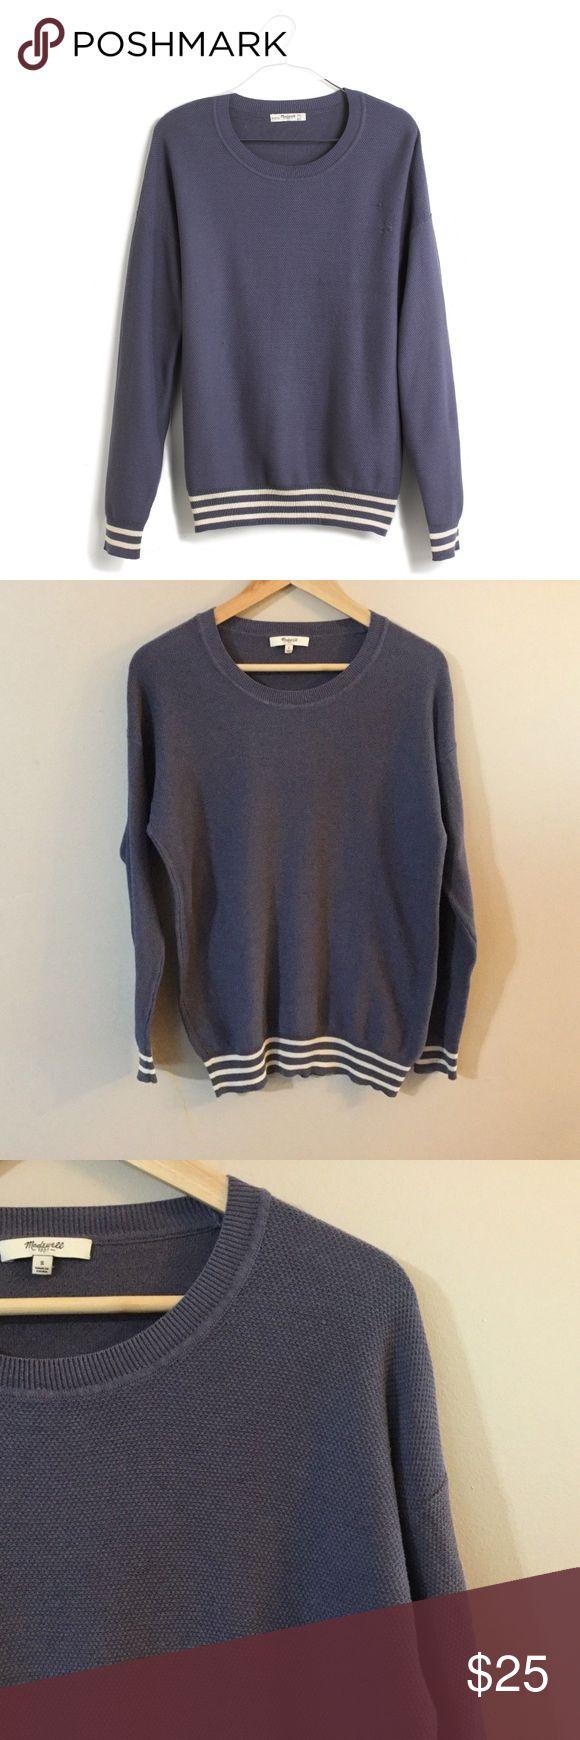 Madewell Vacay Sweater Navy Waffle Knit Sweater S